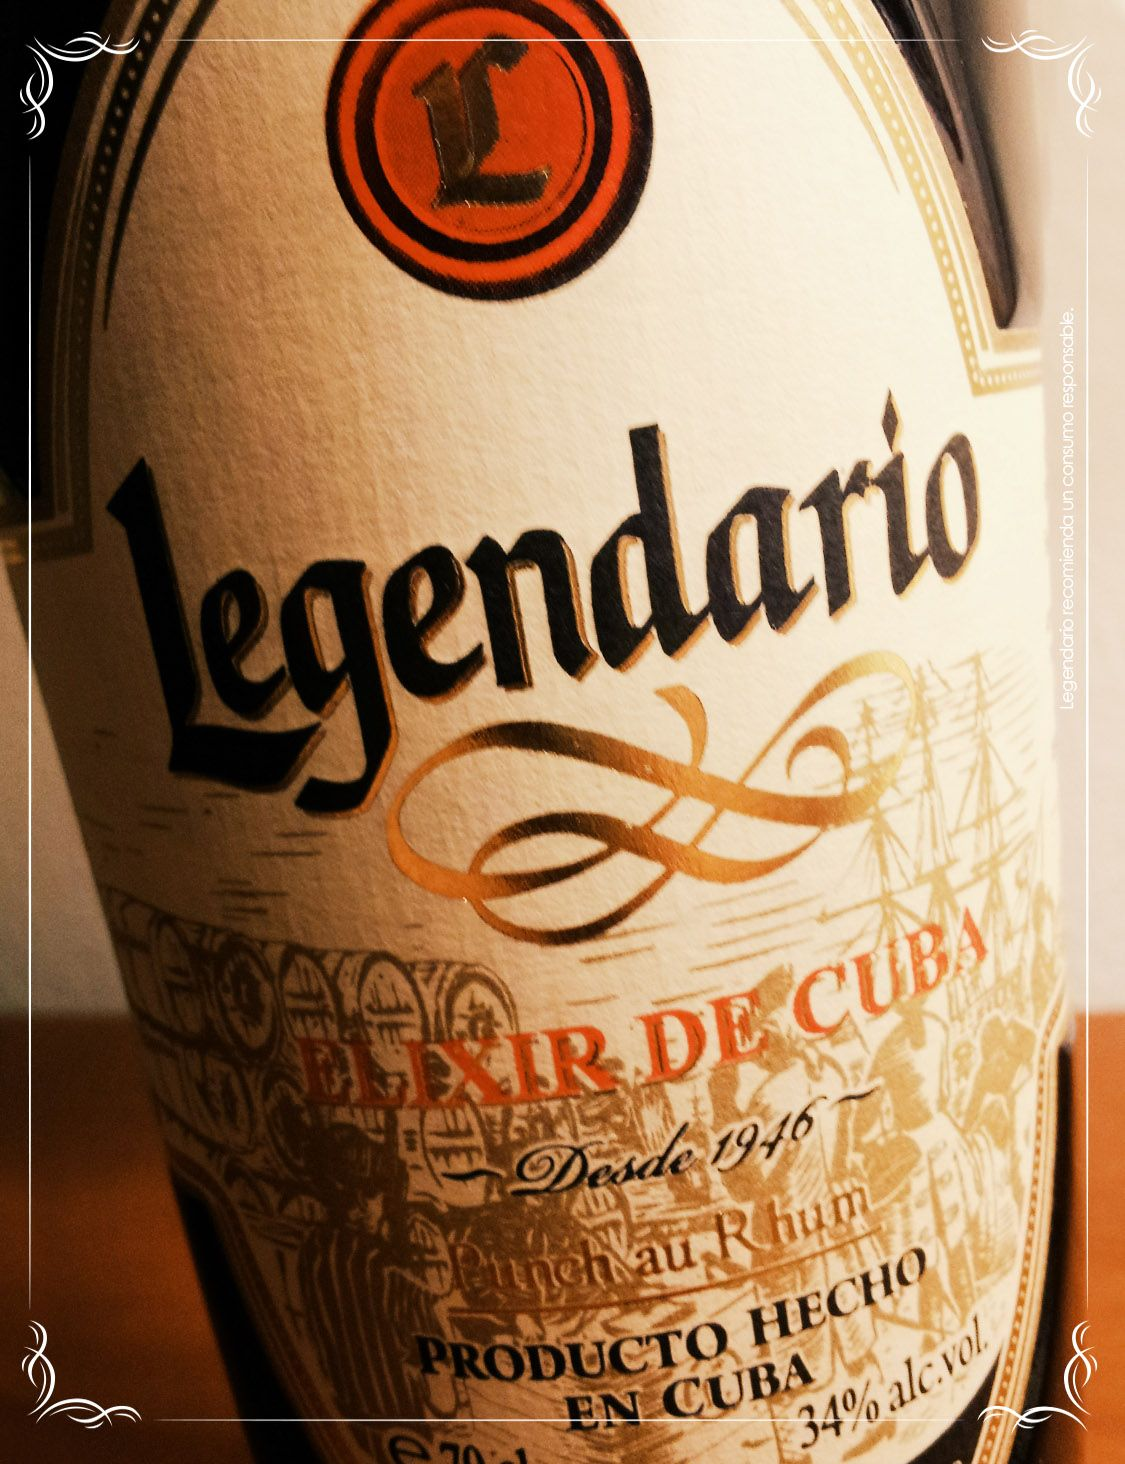 Elixir Legendario, sabor Legendario de origen cubano! Ron